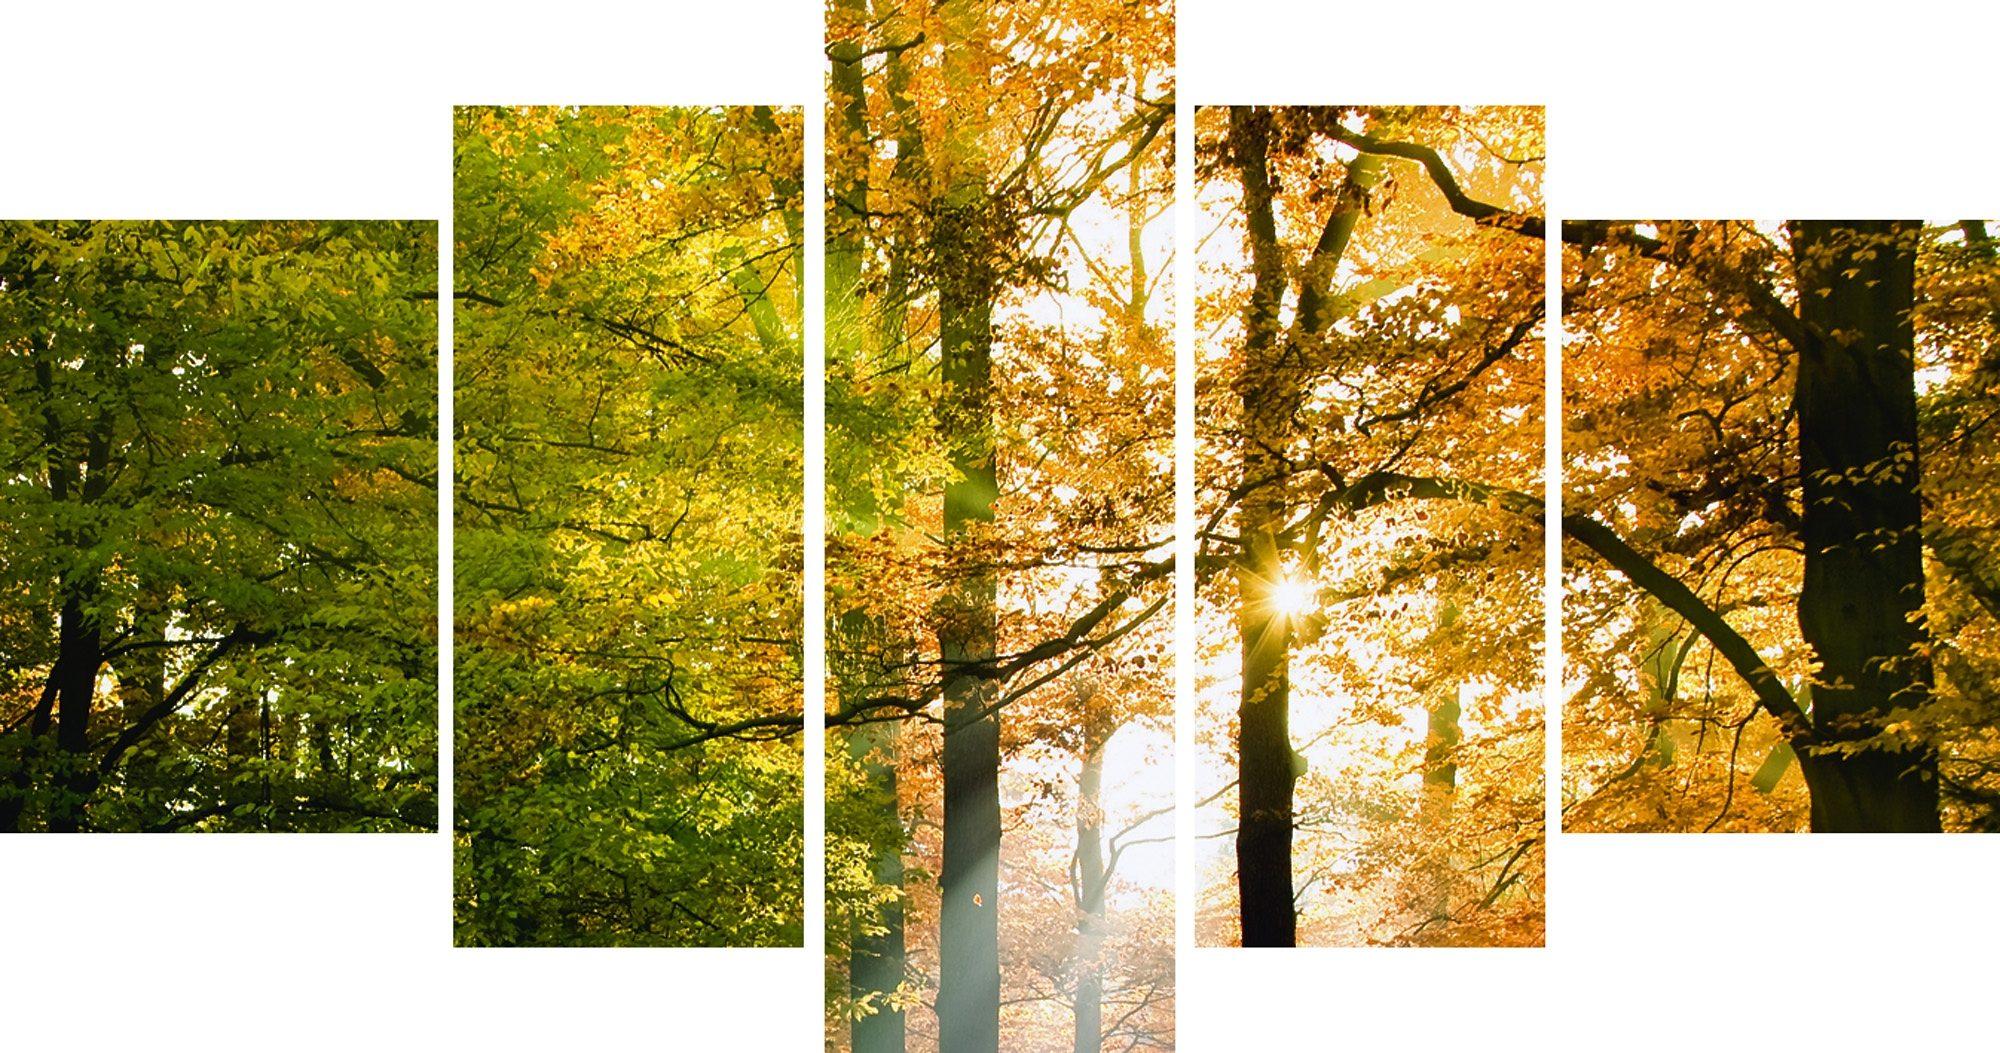 Leinwandbild, Home affaire, »Schöner Herbsttag«, 5tlg., 100/60 cm